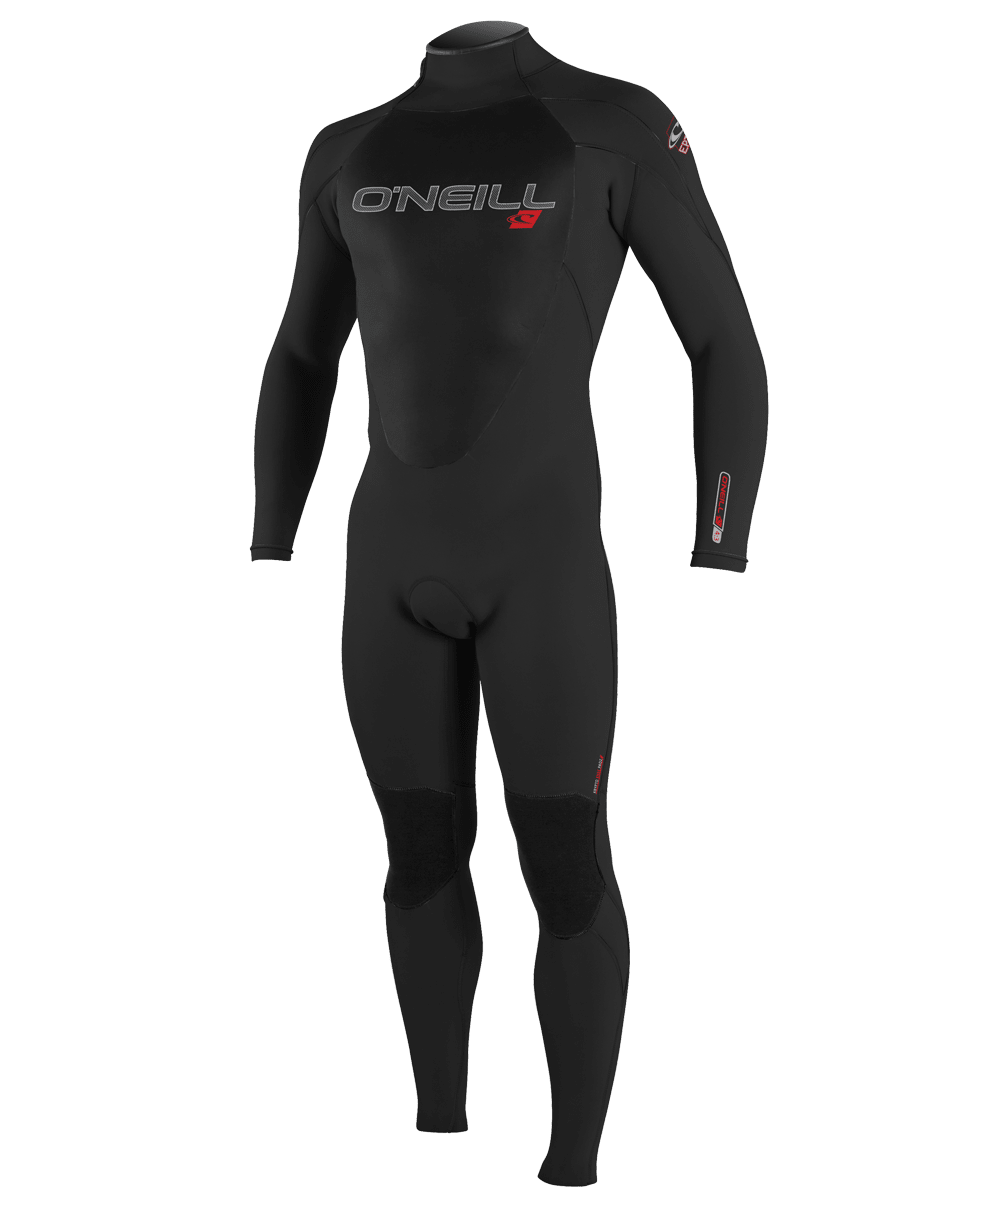 O'NEILL Men's Epic 3/2 mm Wetsuit - BLACK